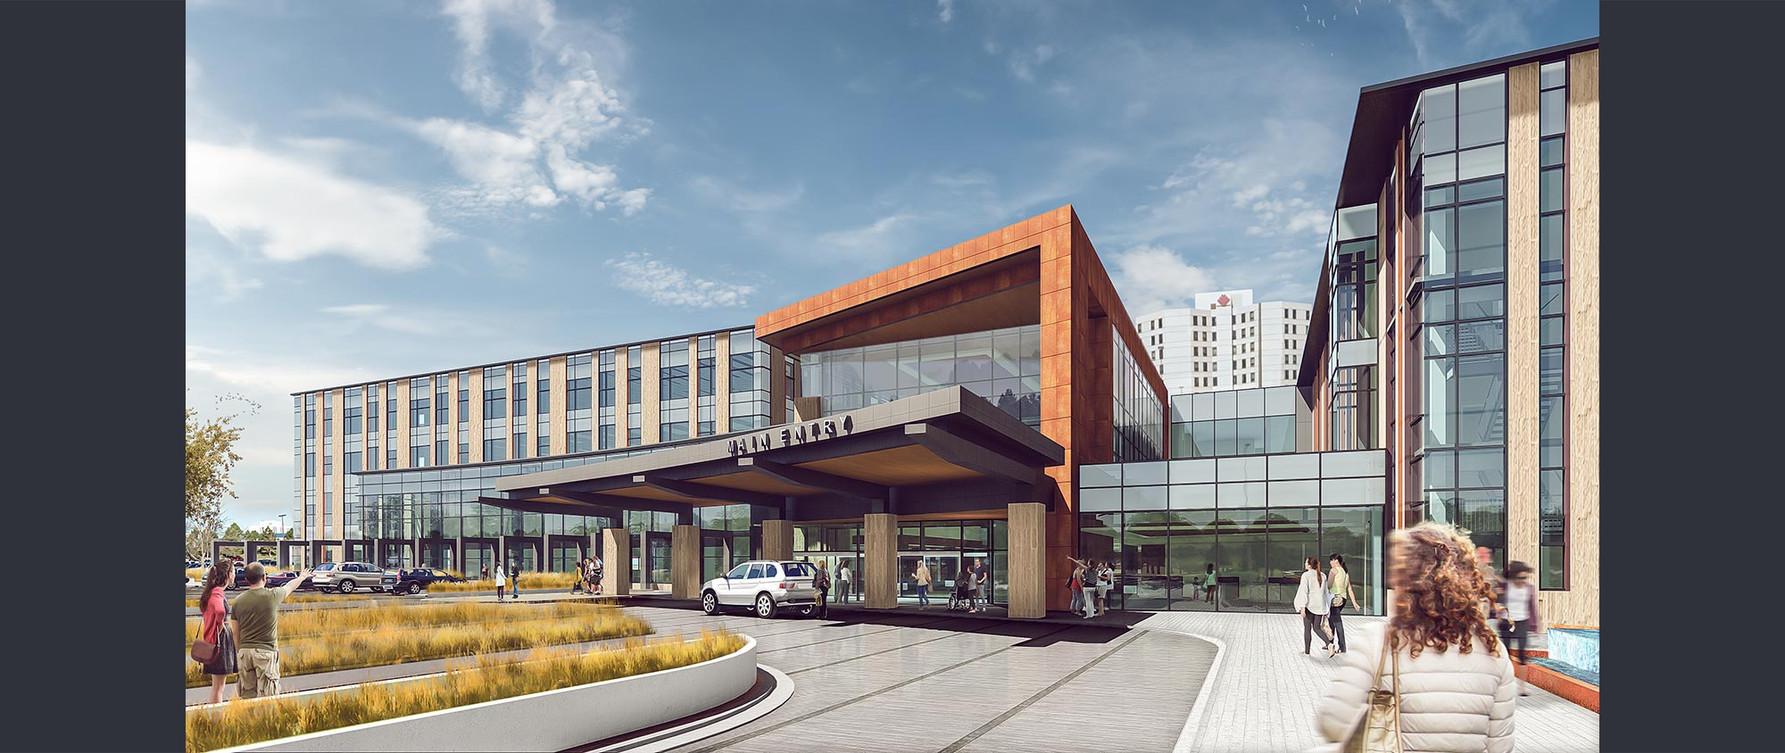 Rapid City Regional Hospital